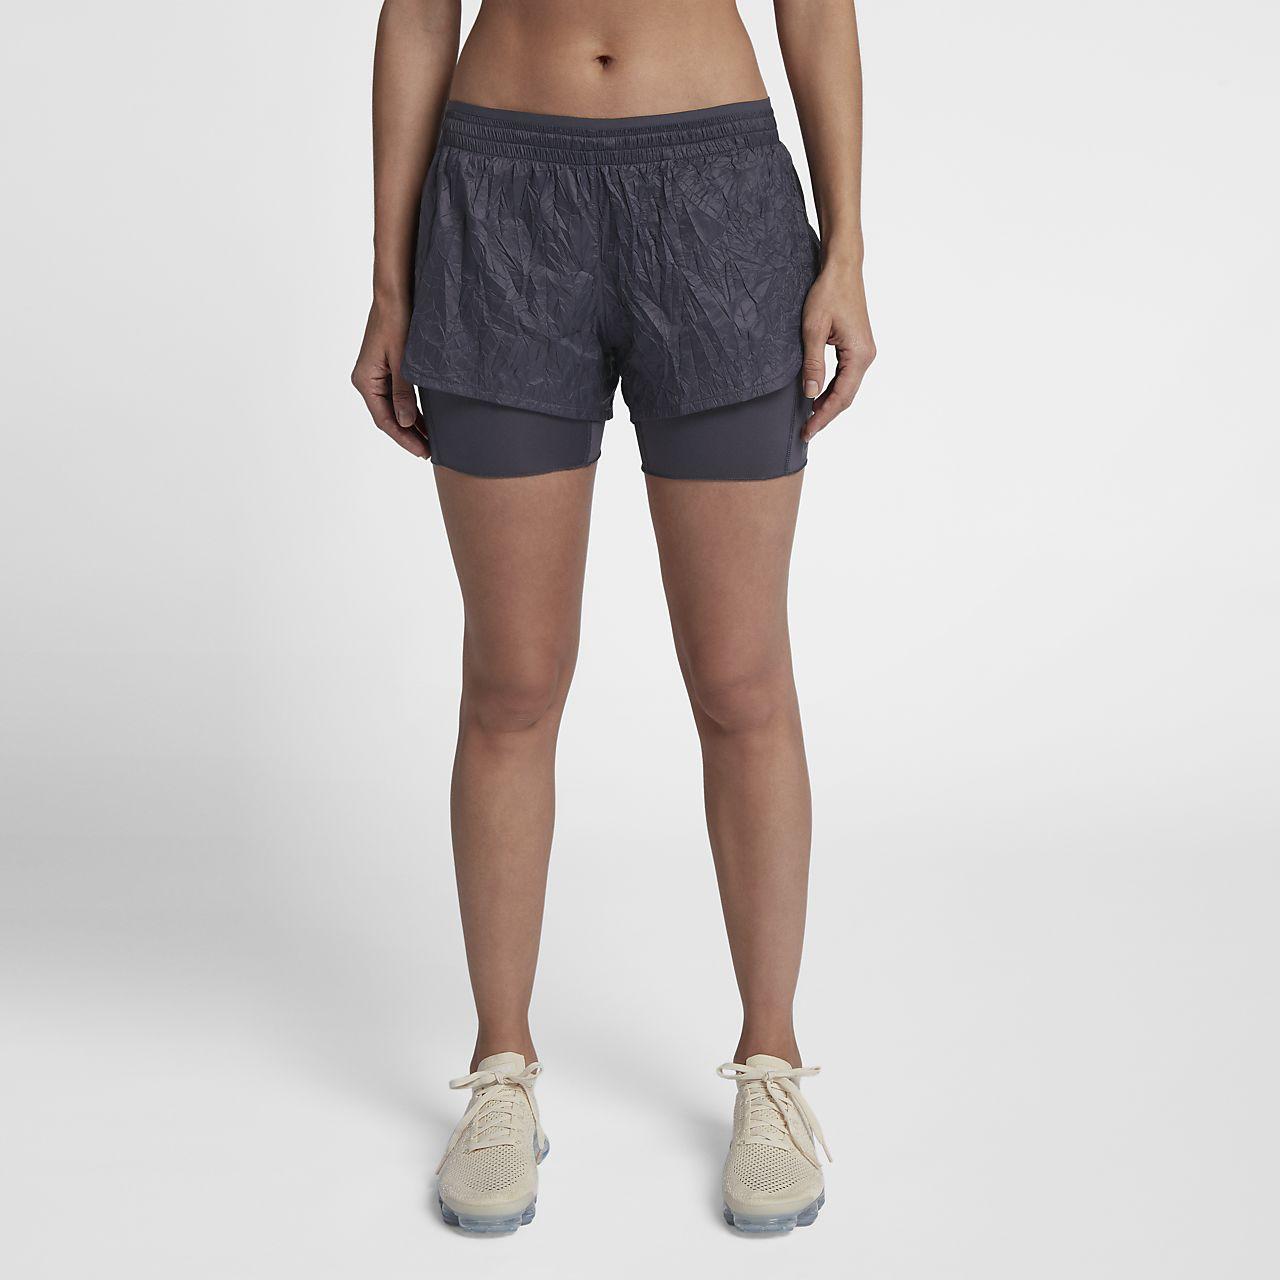 Nike Run Division Women's 2-in-1 Running Shorts